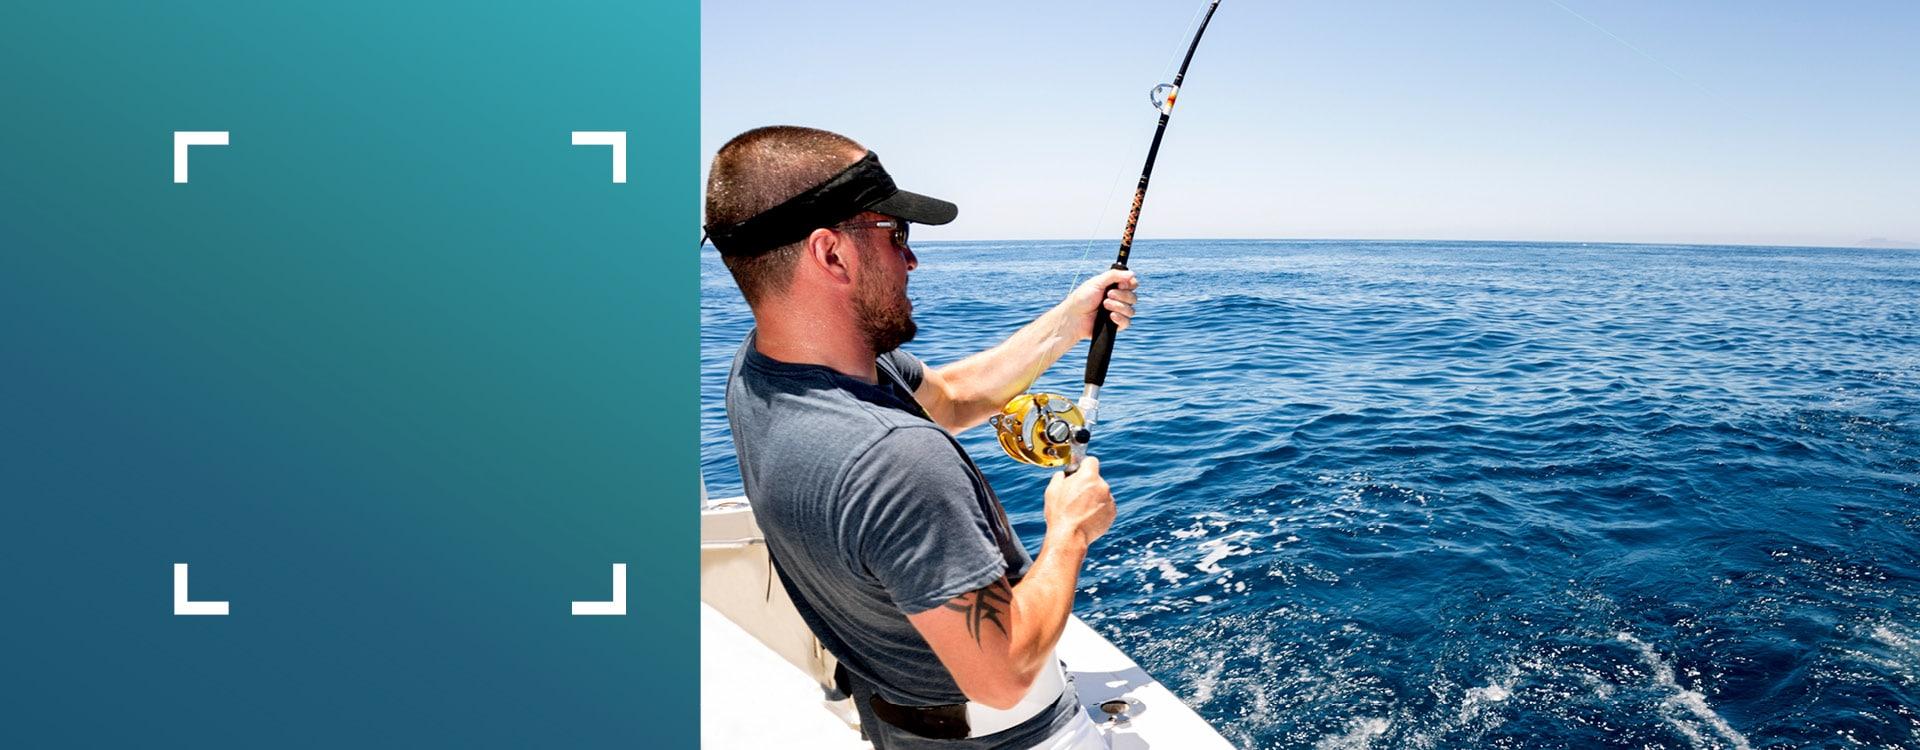 Experts techniques de pêche